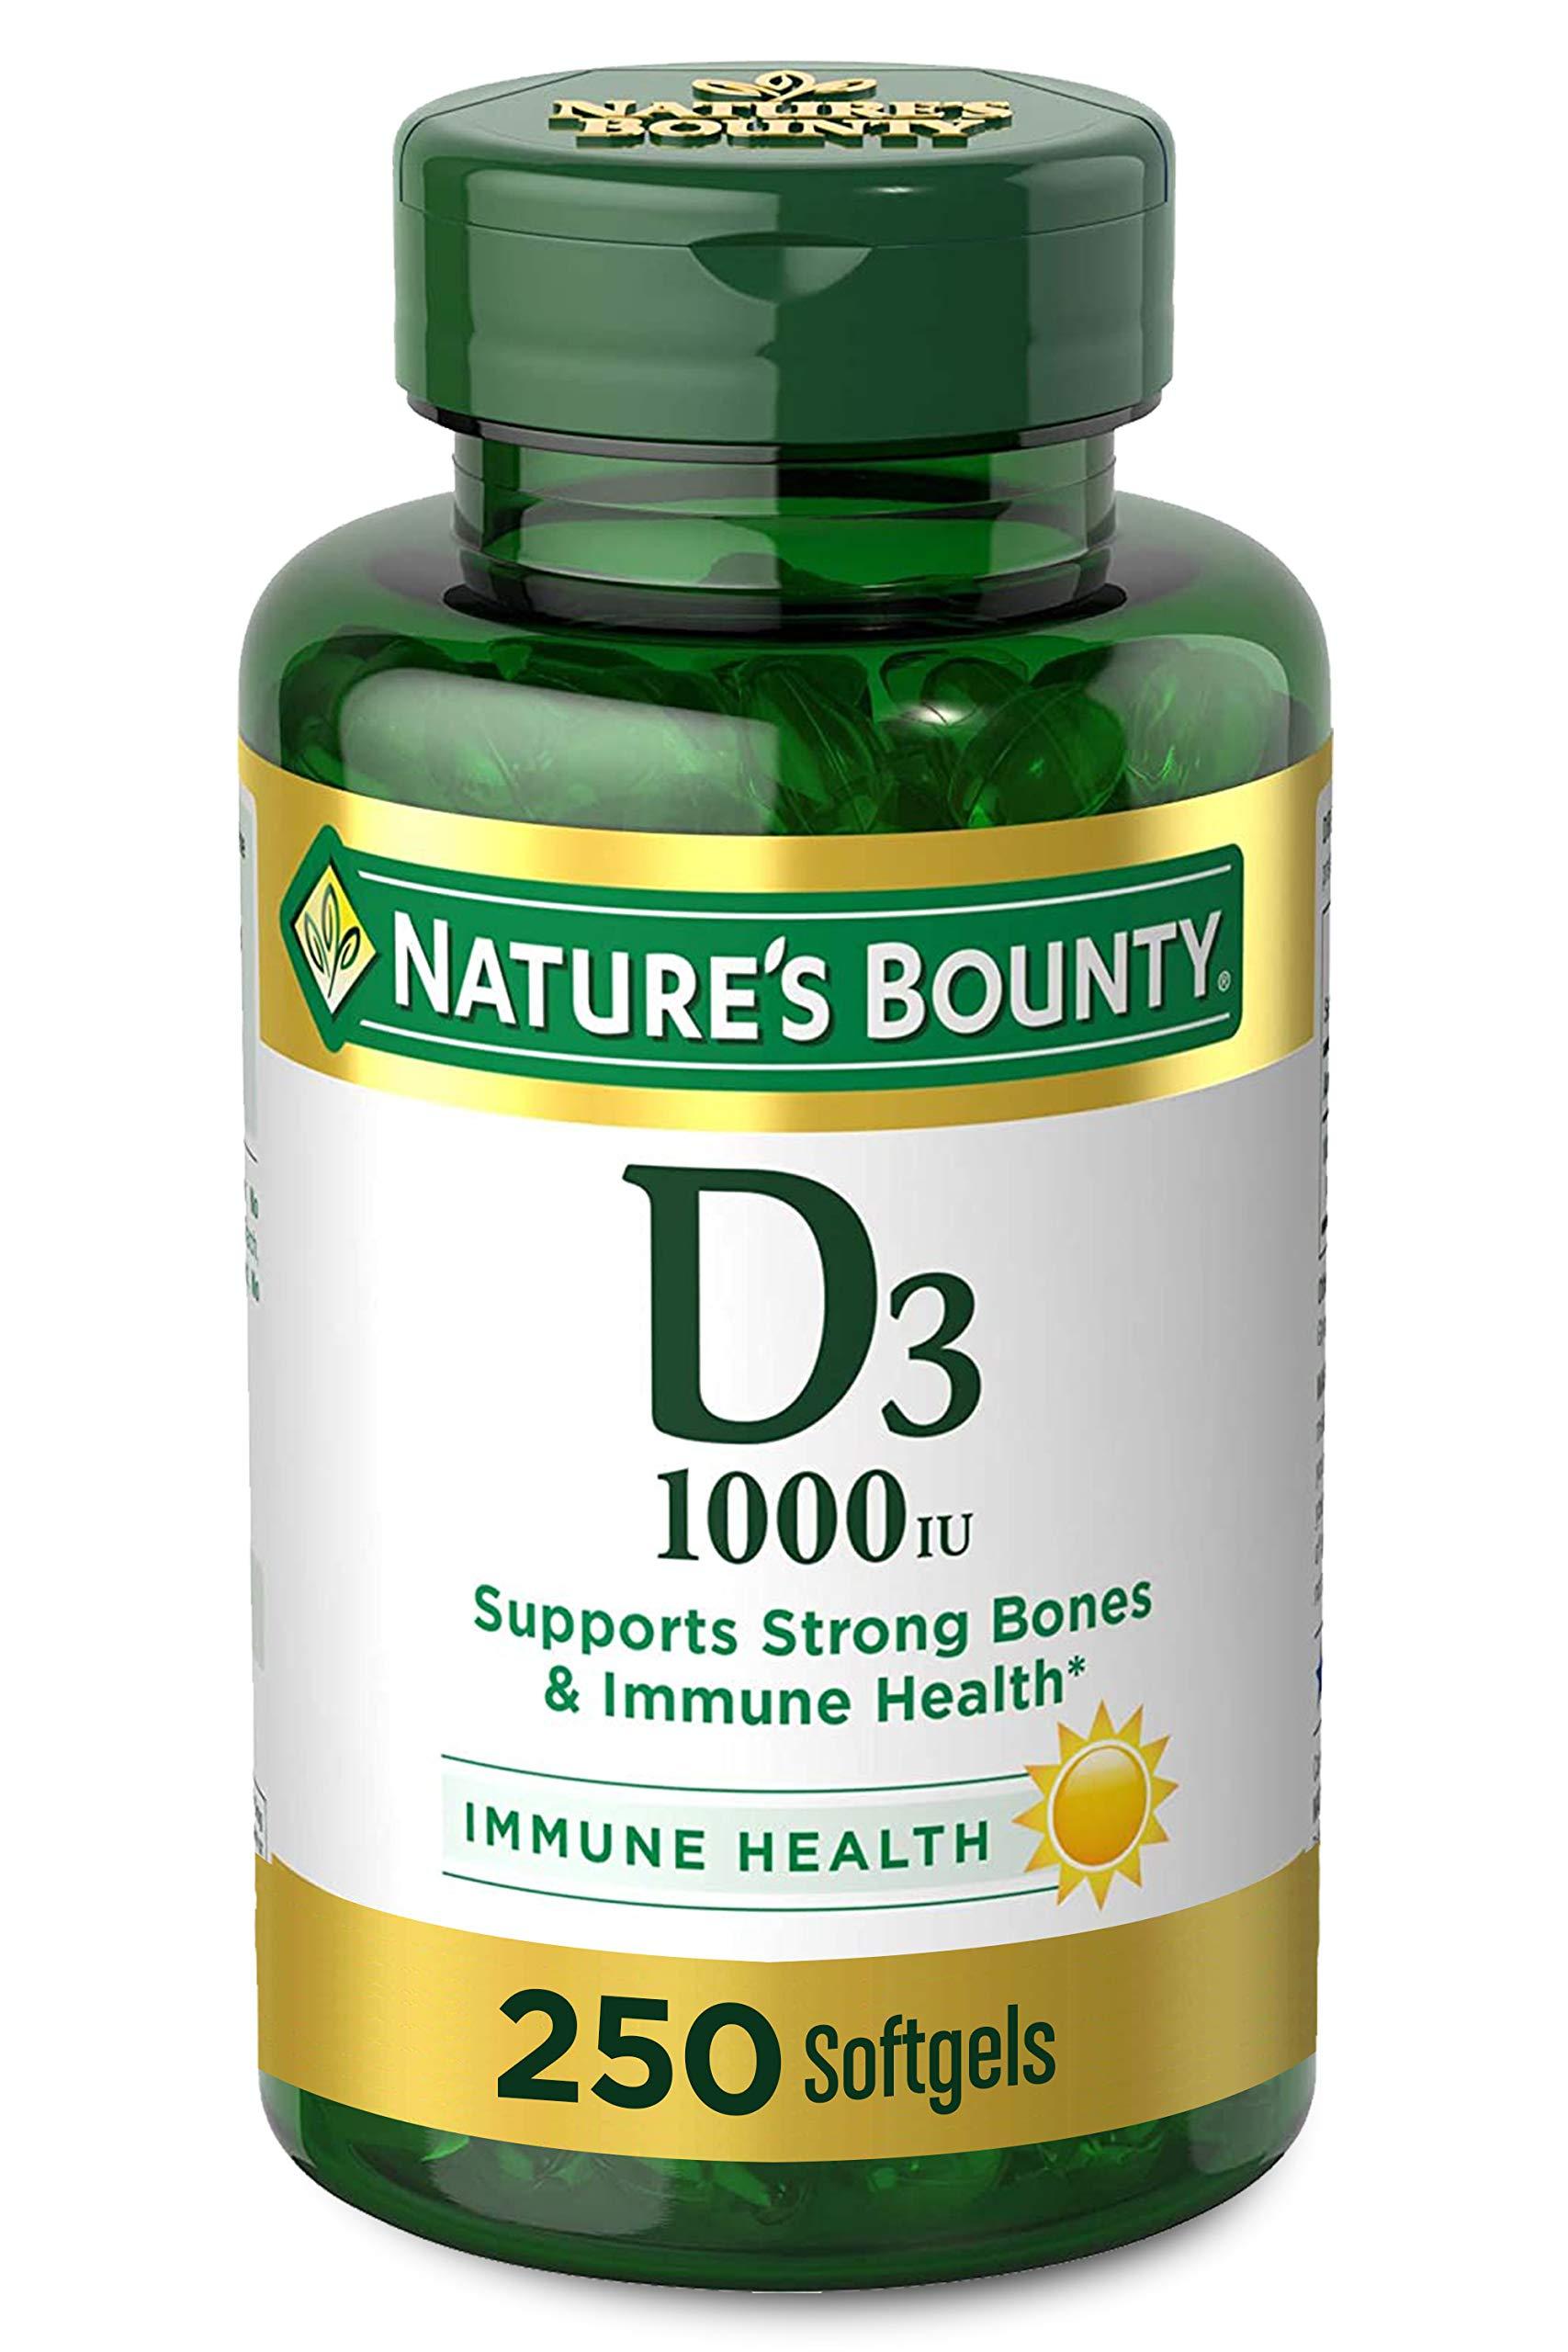 Vitamin D by Nature's Bounty for immune support. Vitamin D provides immune support and promotes healthy bones. 1000IU, 250 Softgels